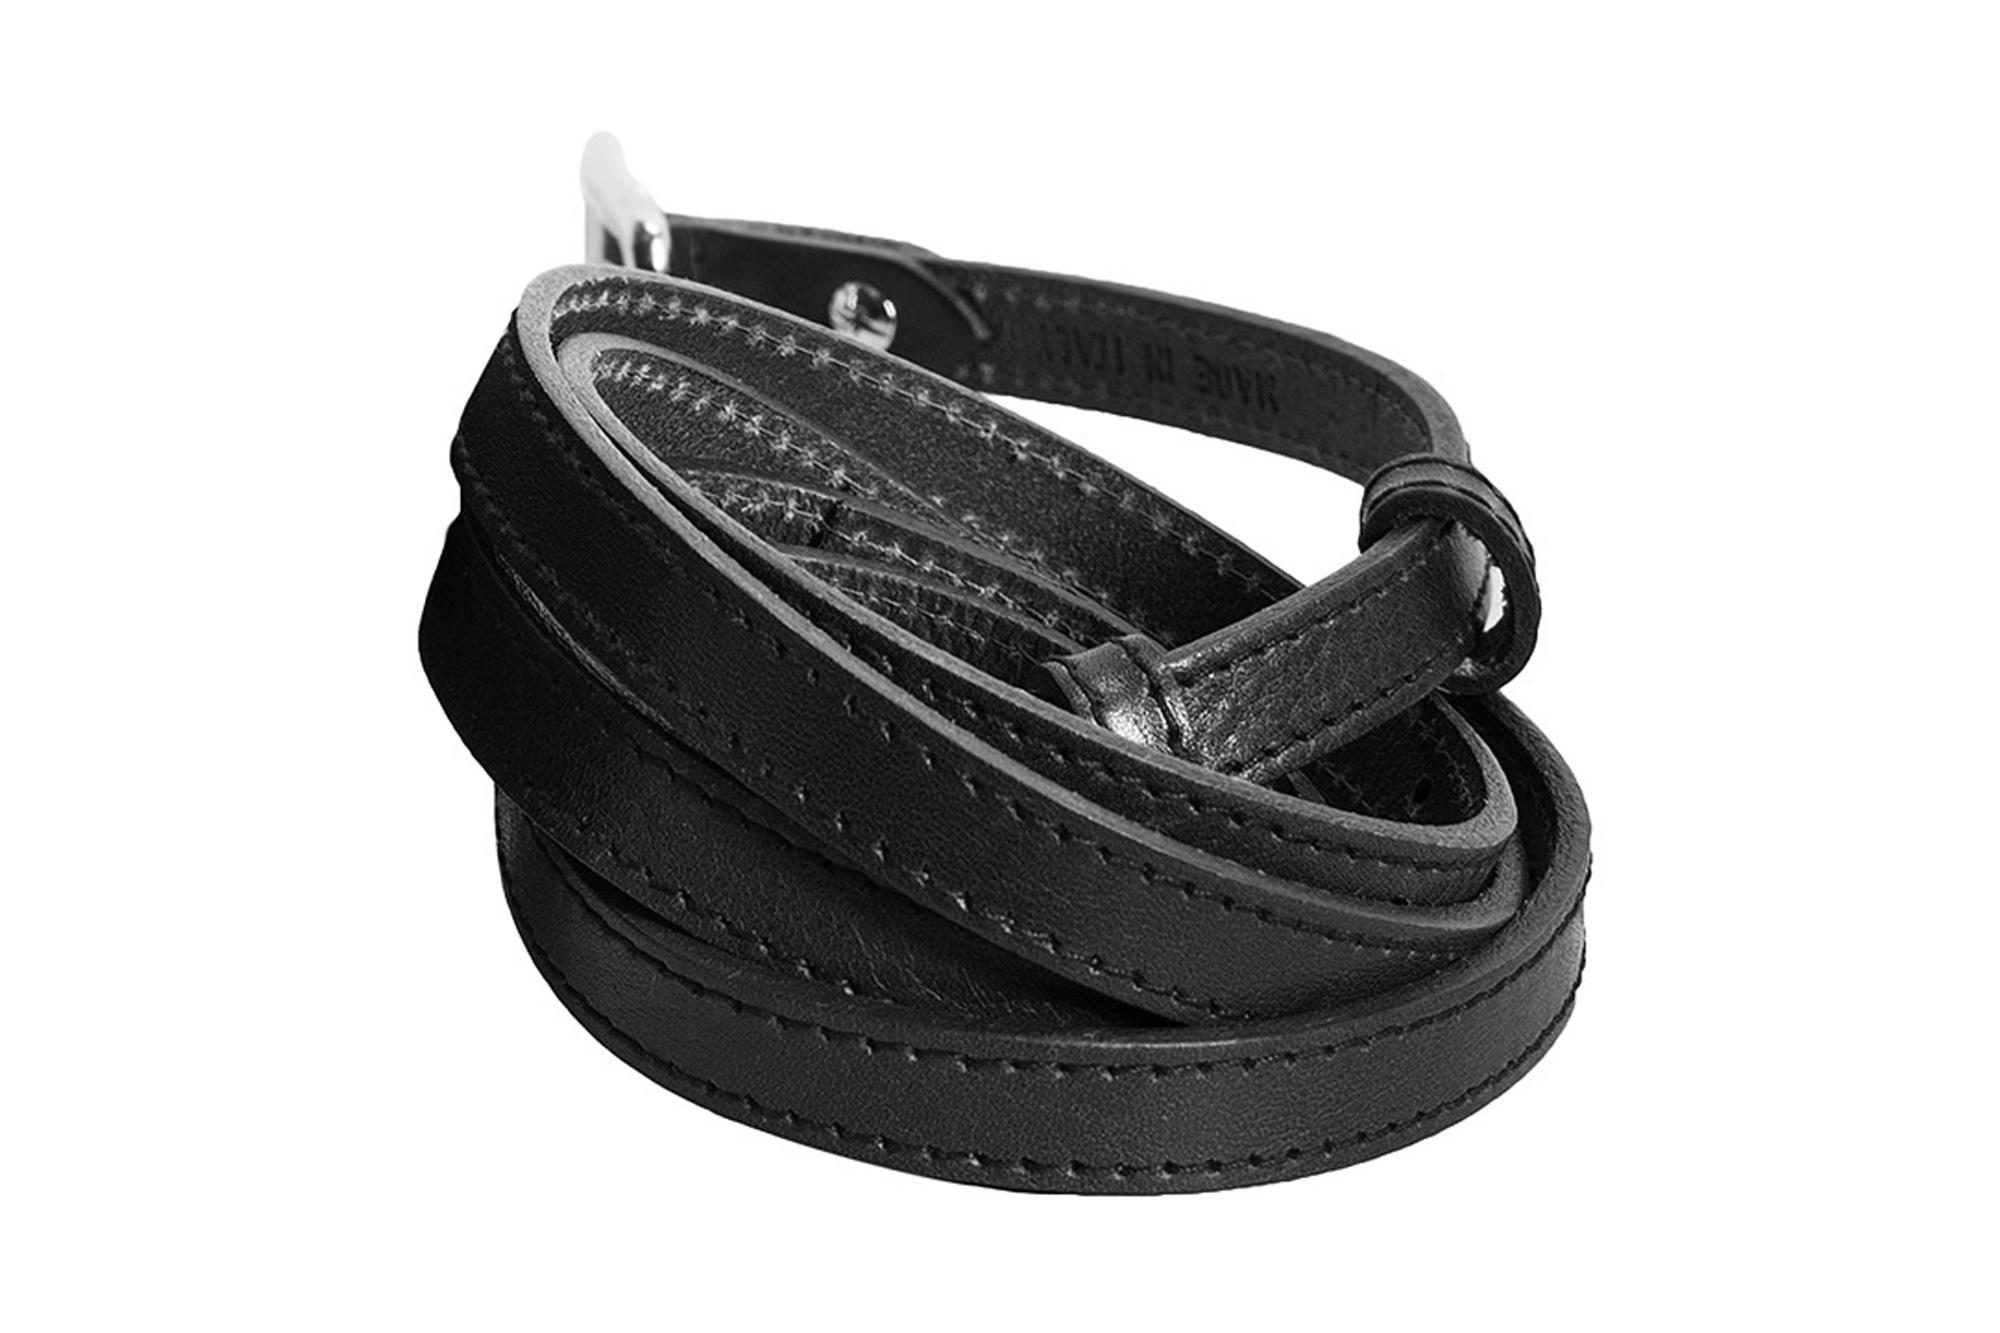 Sas Black Leather Shoes